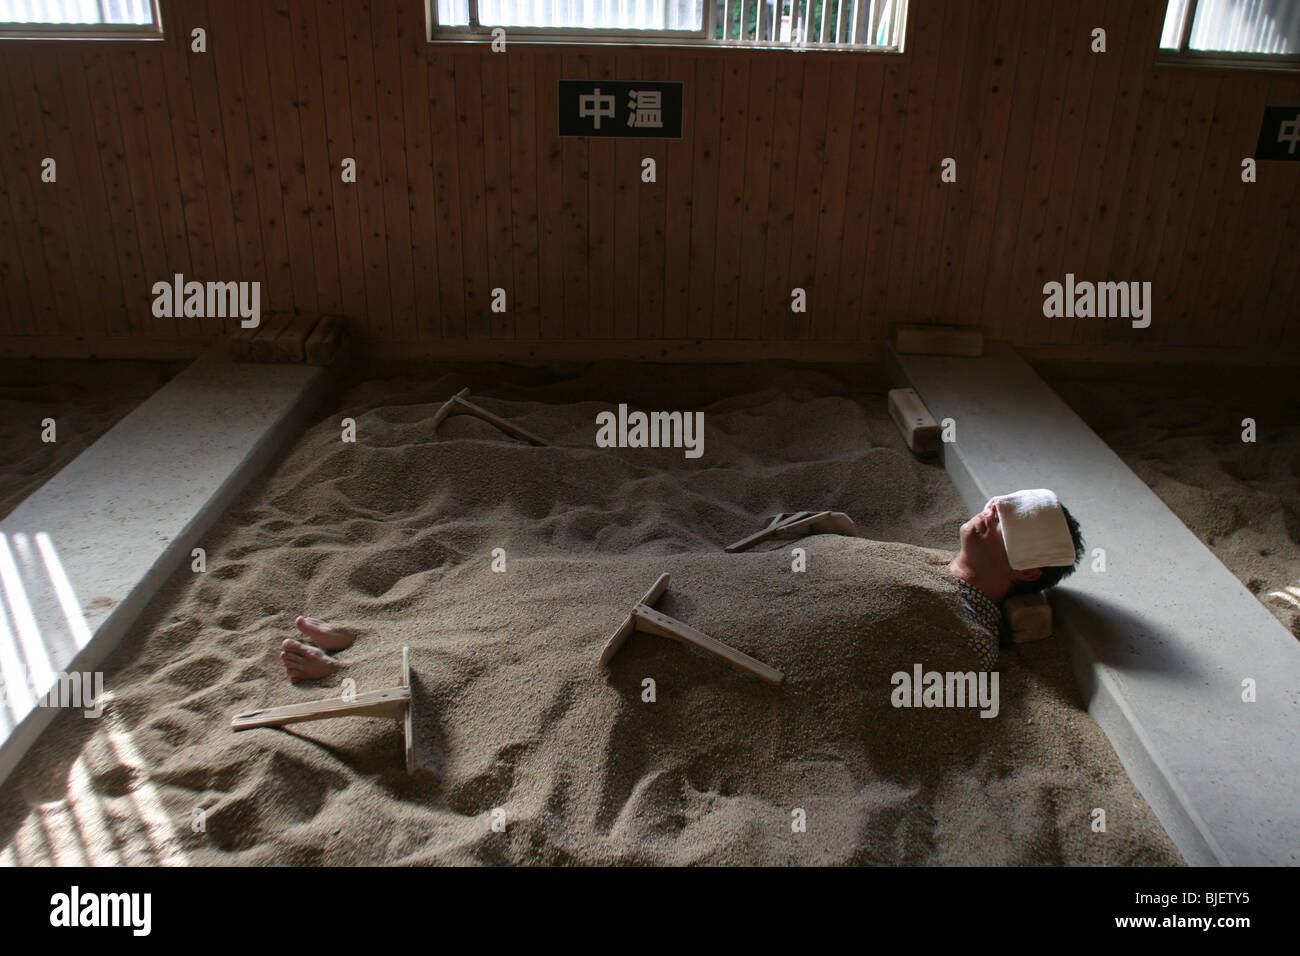 Man takes a sand bath at the 'Hyoten Onsen', Beppu, Japan. 20.10.2005 - Stock Image